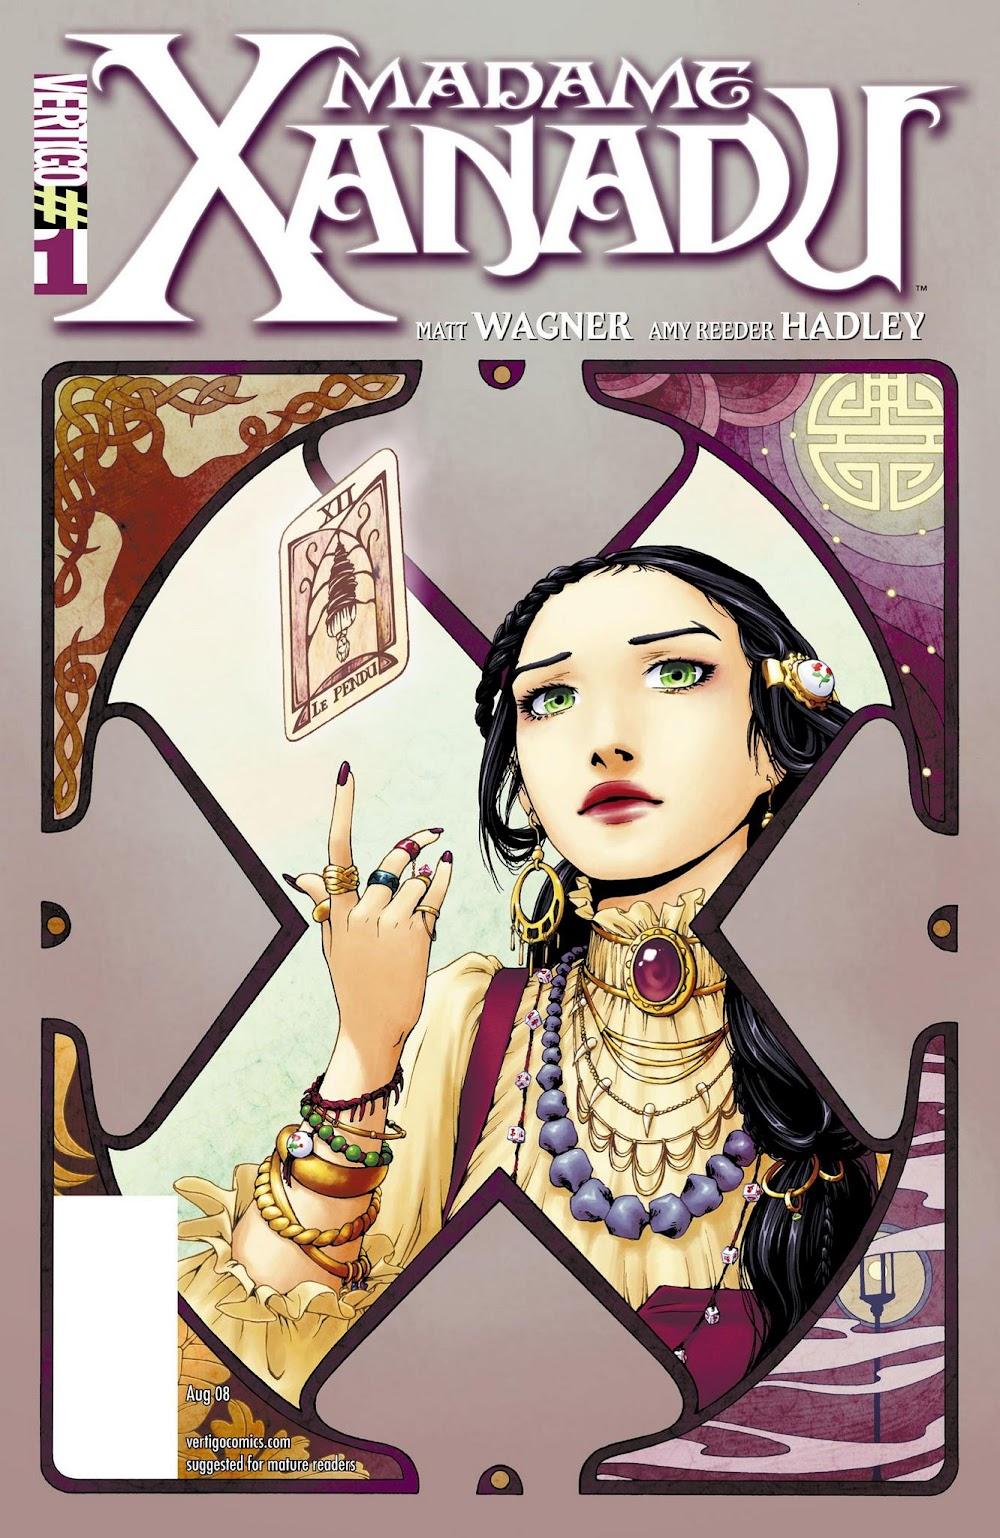 Madame Xanadu (2008) - complete